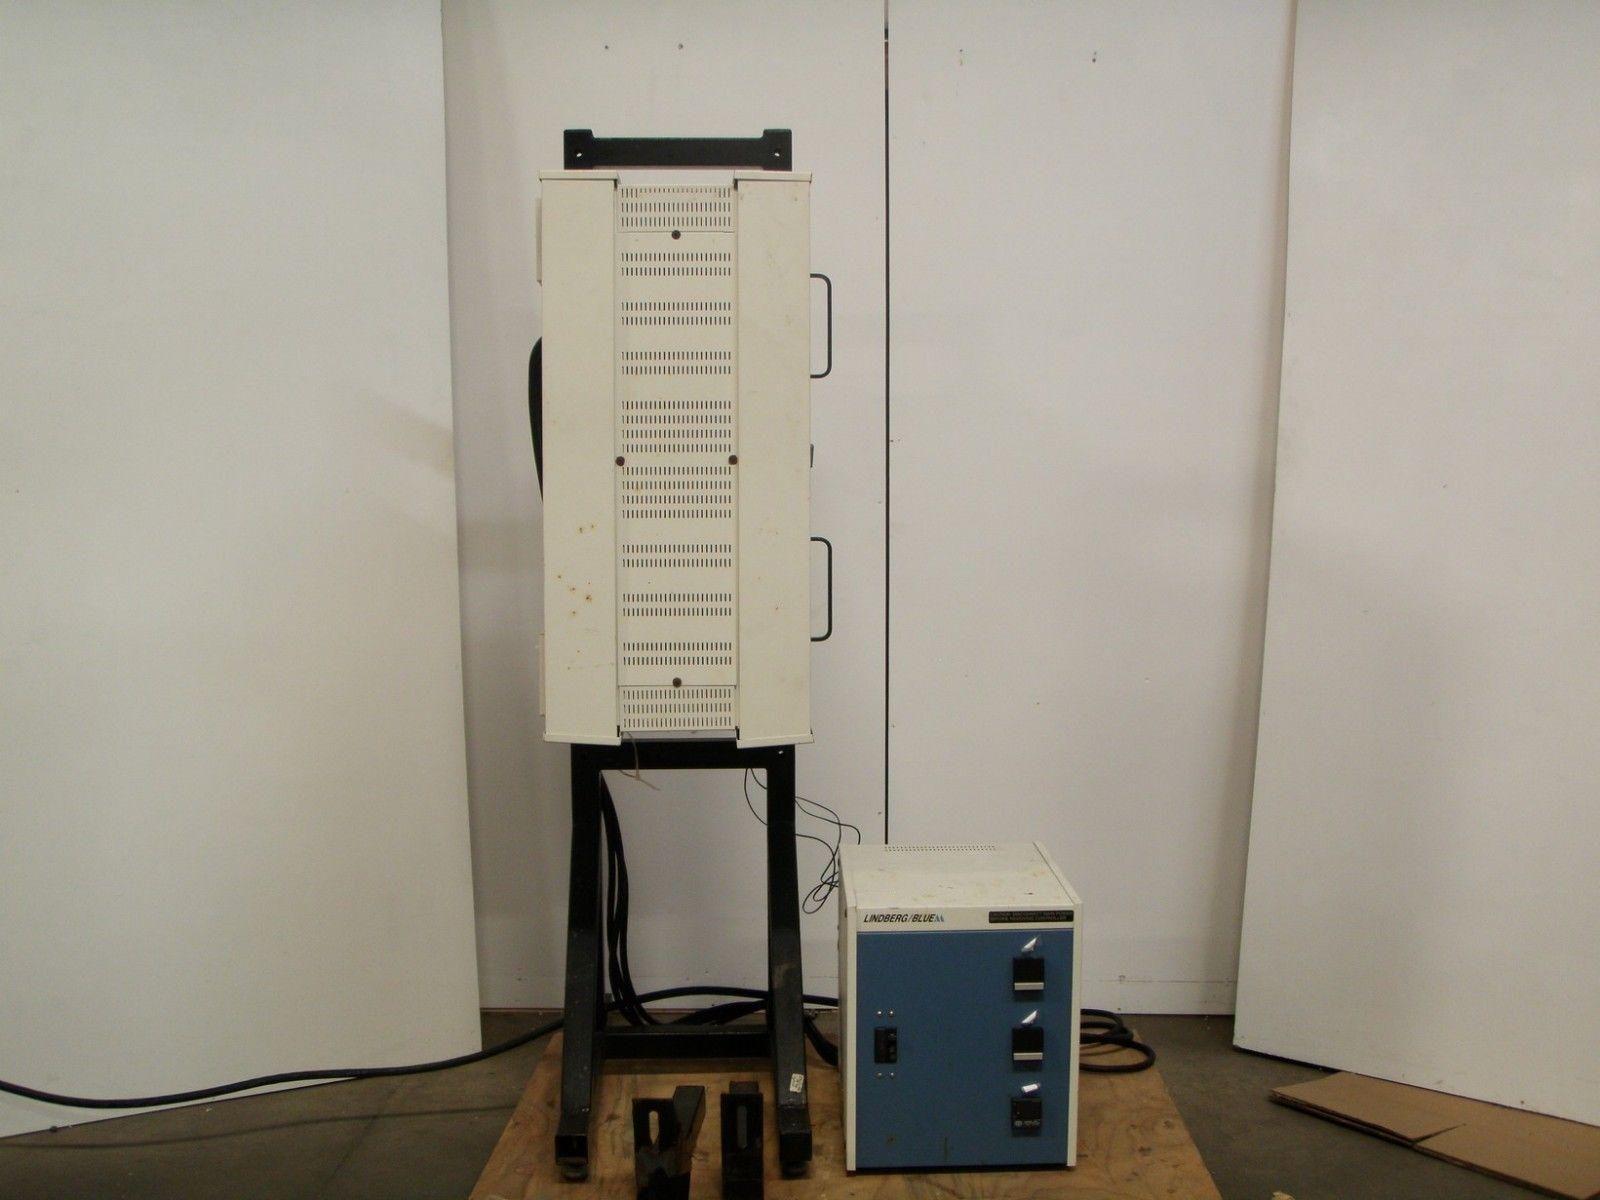 Lindberg / Blue M Tube Furnace w/ Control Consoles